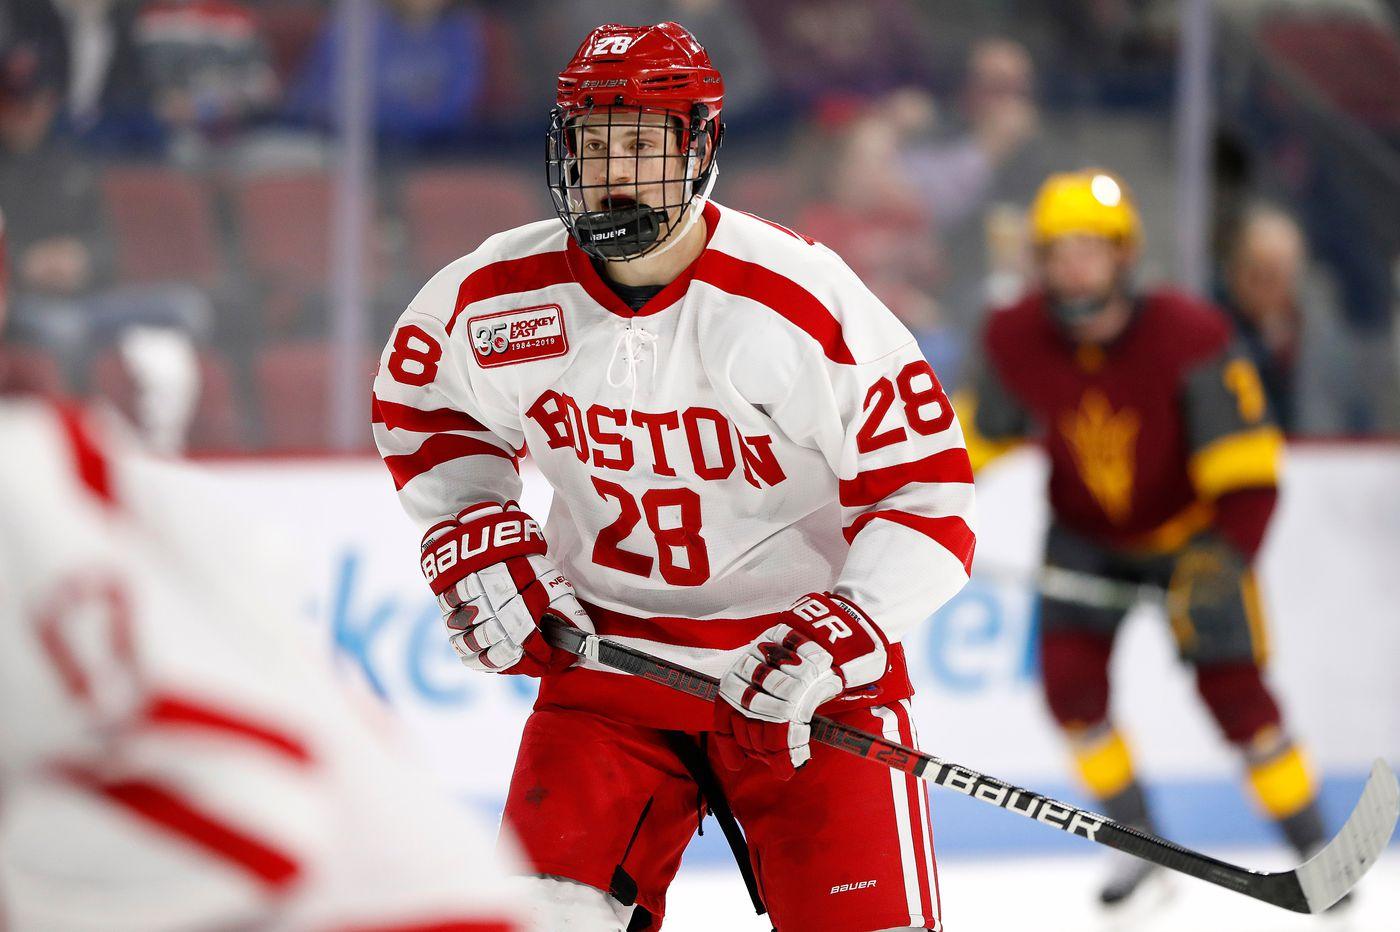 Flyers prospect Joel Farabee named nation's top freshman; Felix Sandstrom impressive in AHL debut